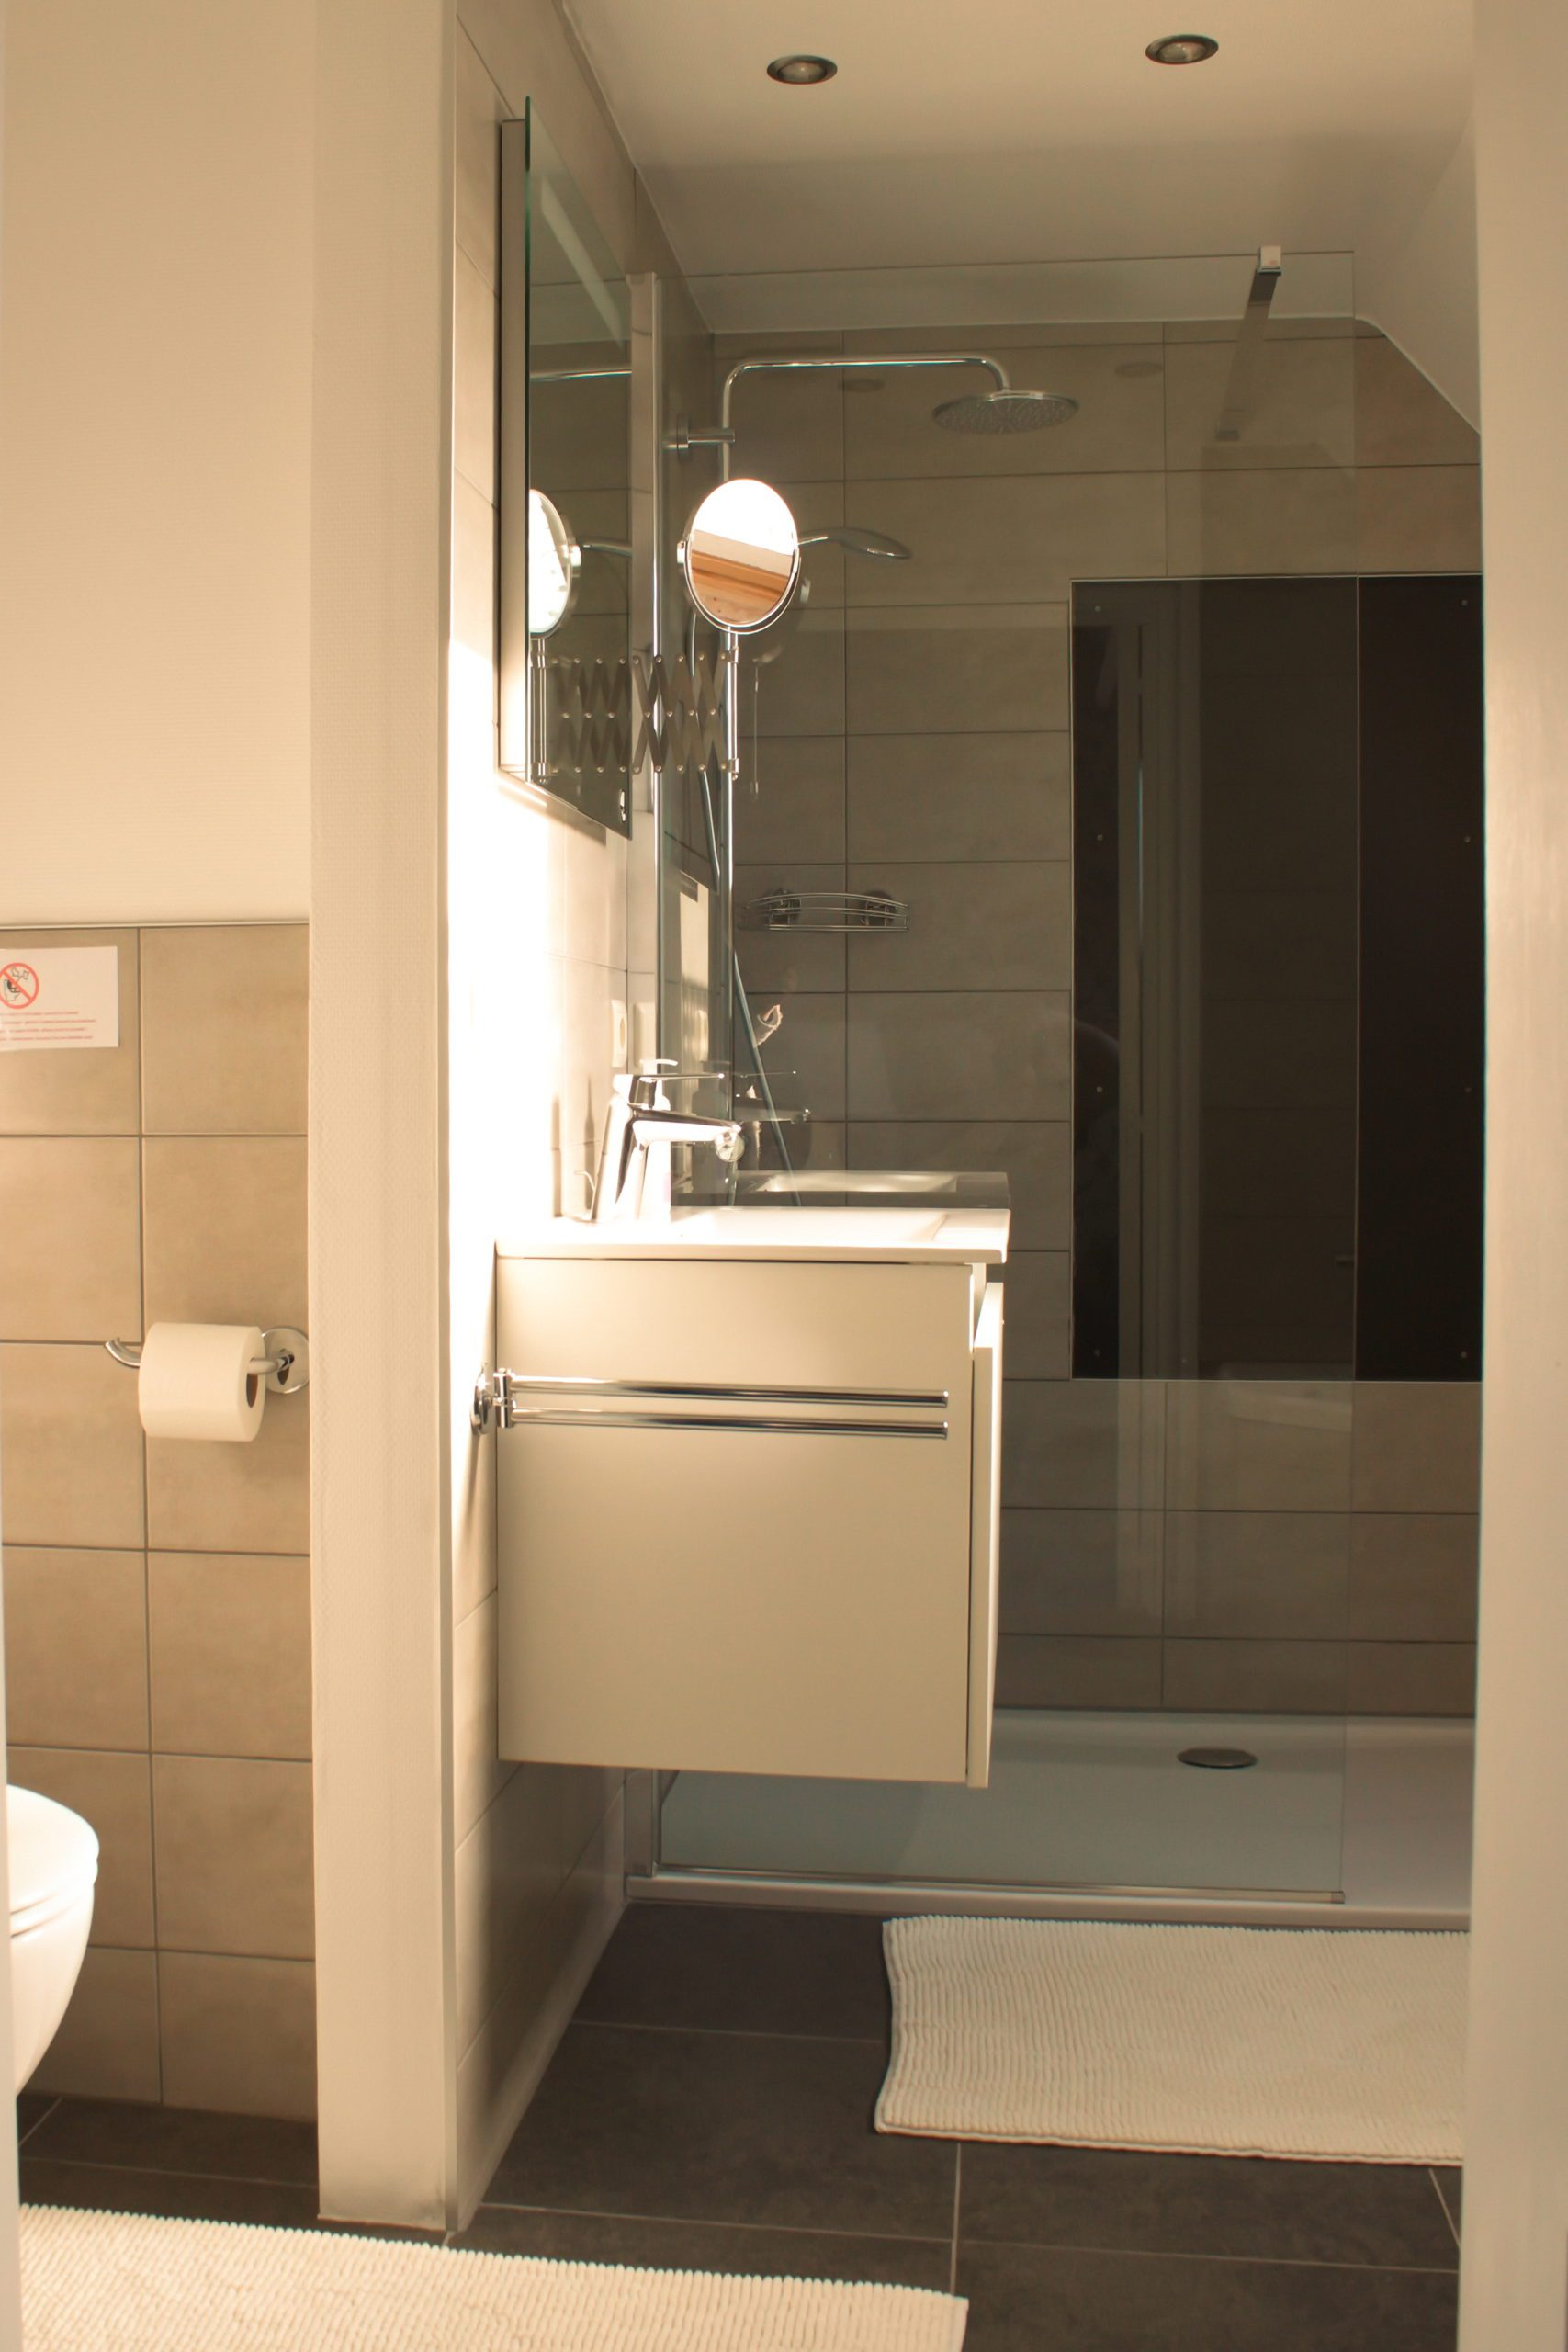 Totaal gerenoveerde badkamer gastenkamer Côté Ciel overdag